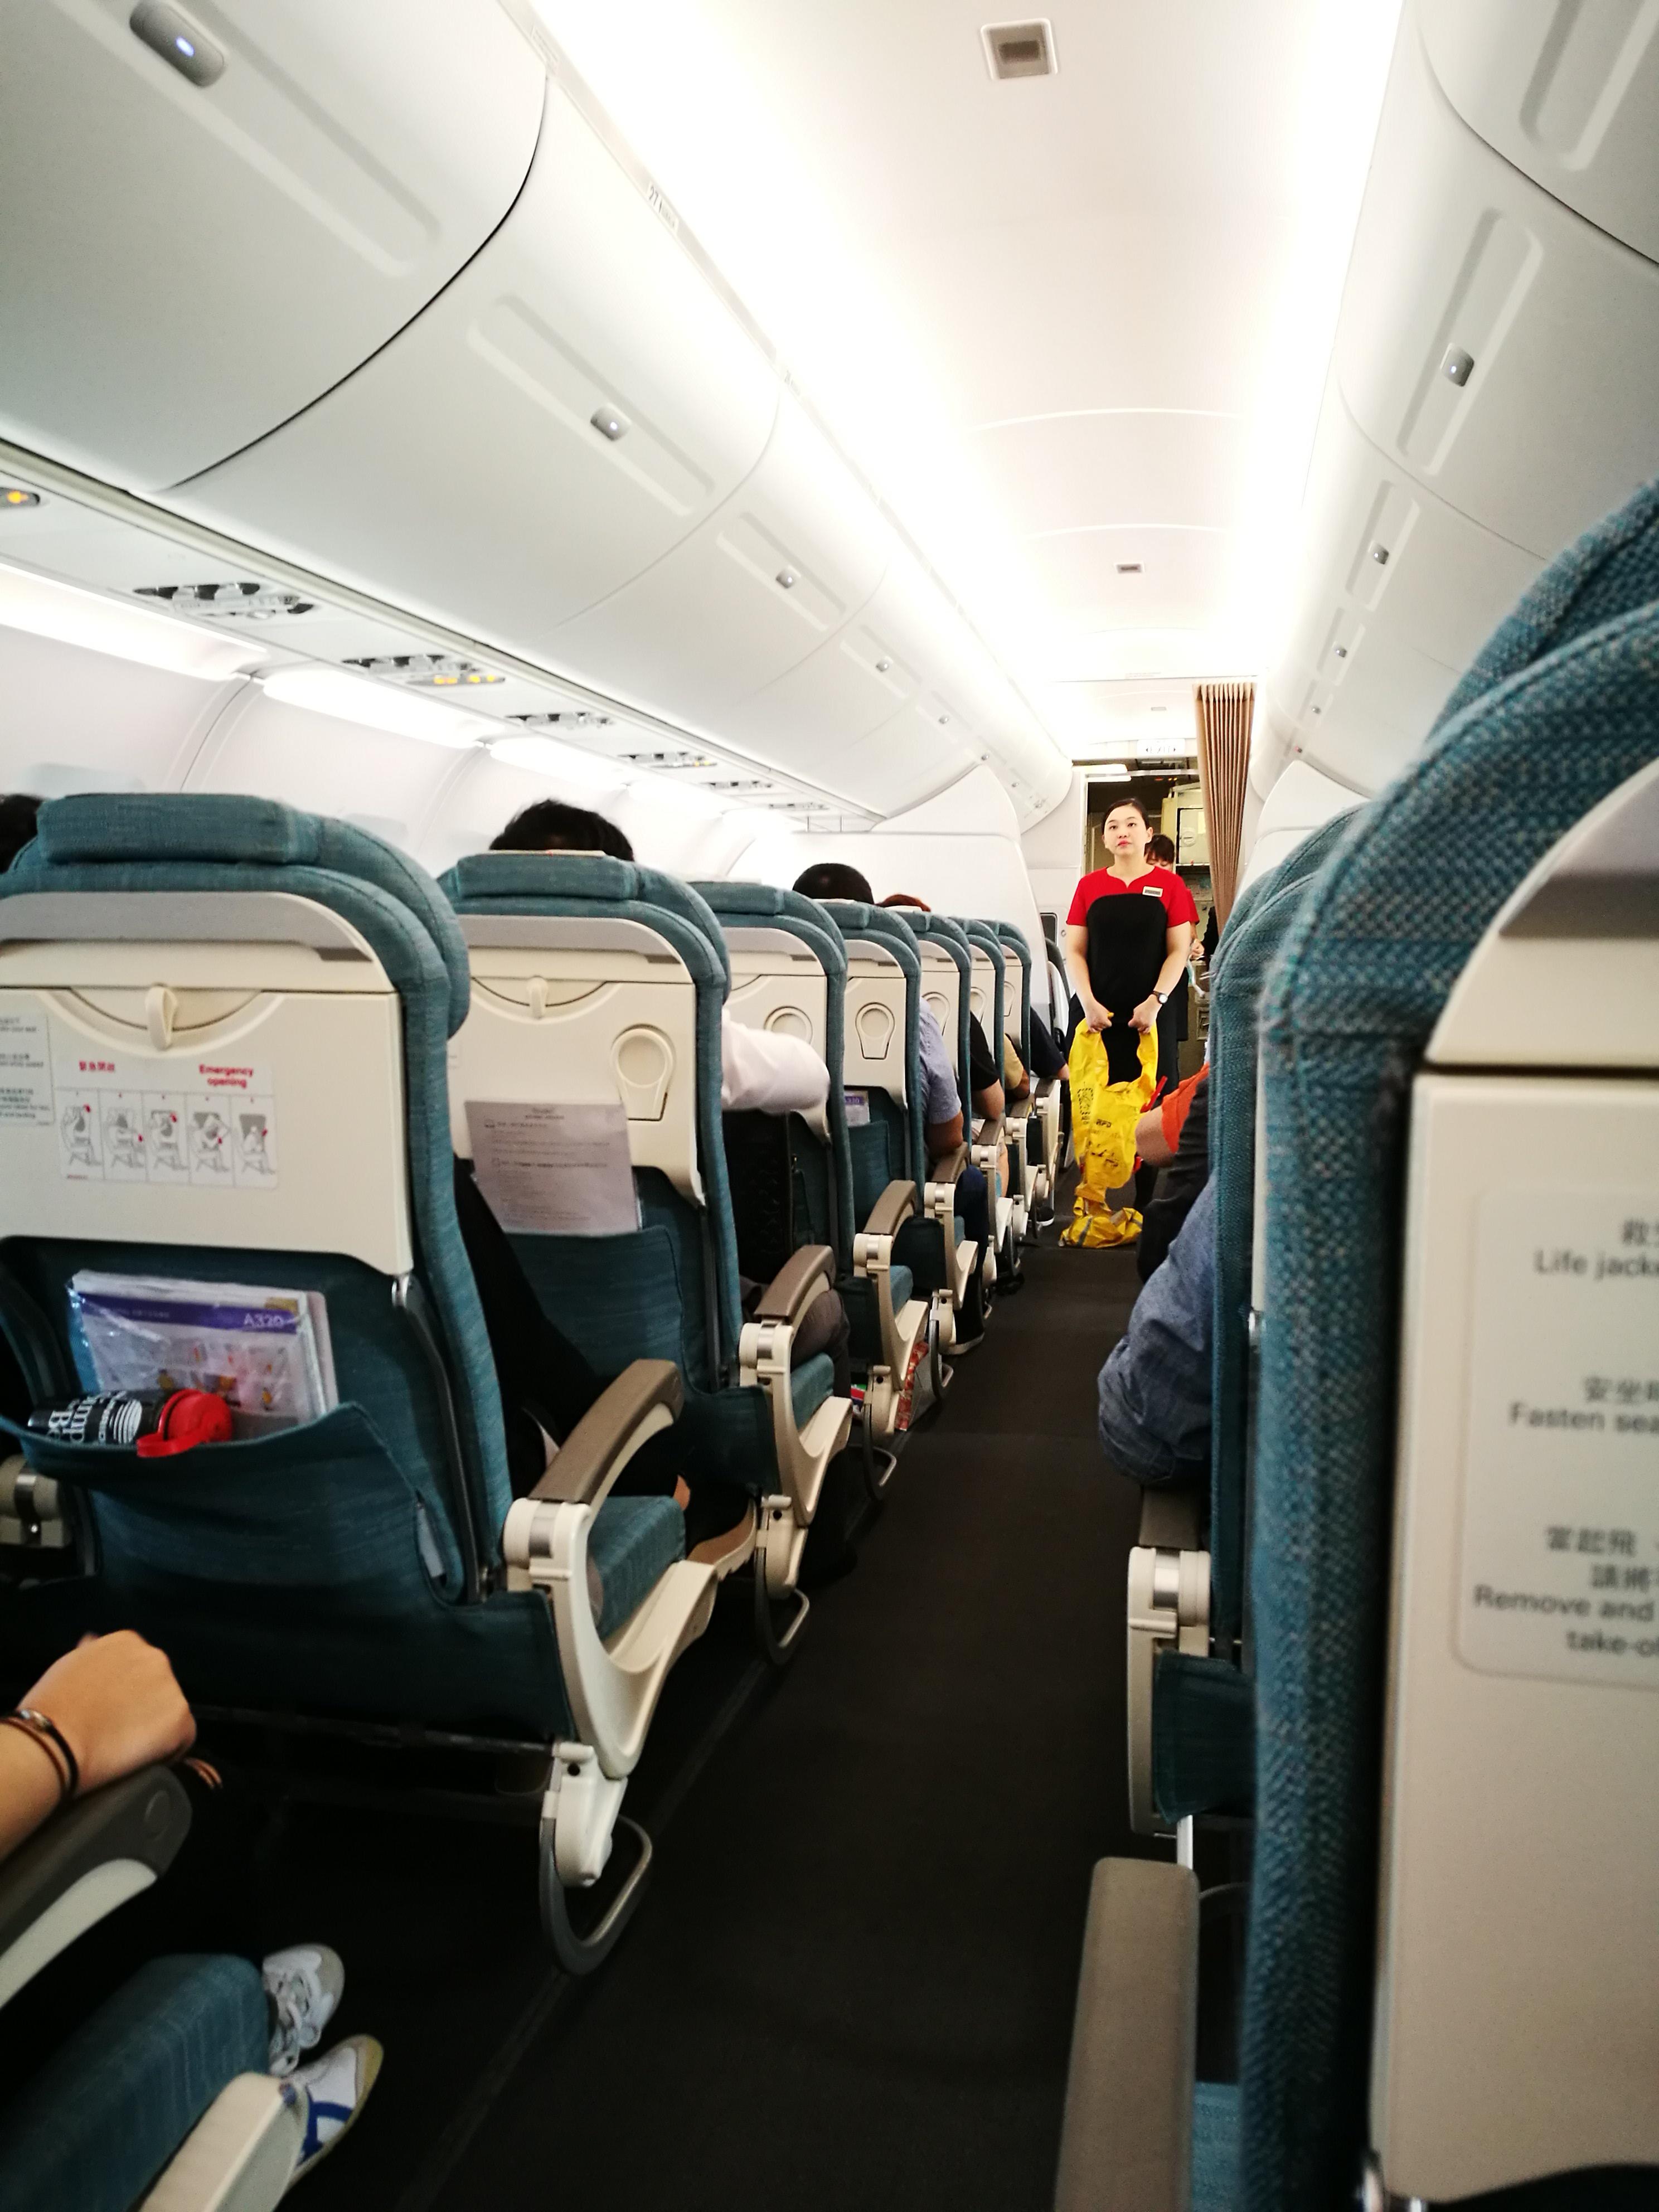 Dragonair Customer Reviews | SKYTRAX